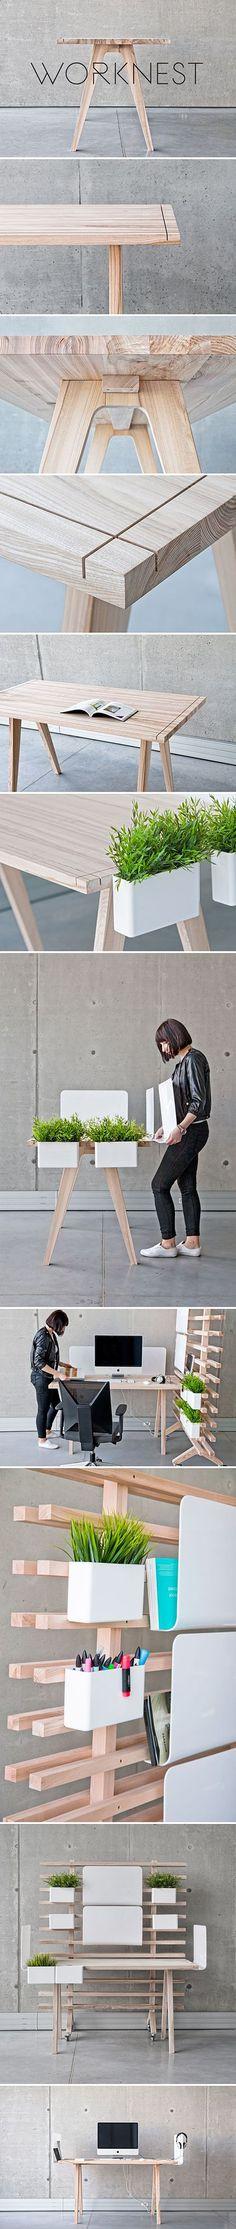 Worknest: handcrafted modular workplace, design from Wiktoria Lenart.   Handgemaakt modulaire werkplek. Wood desk, wood table,